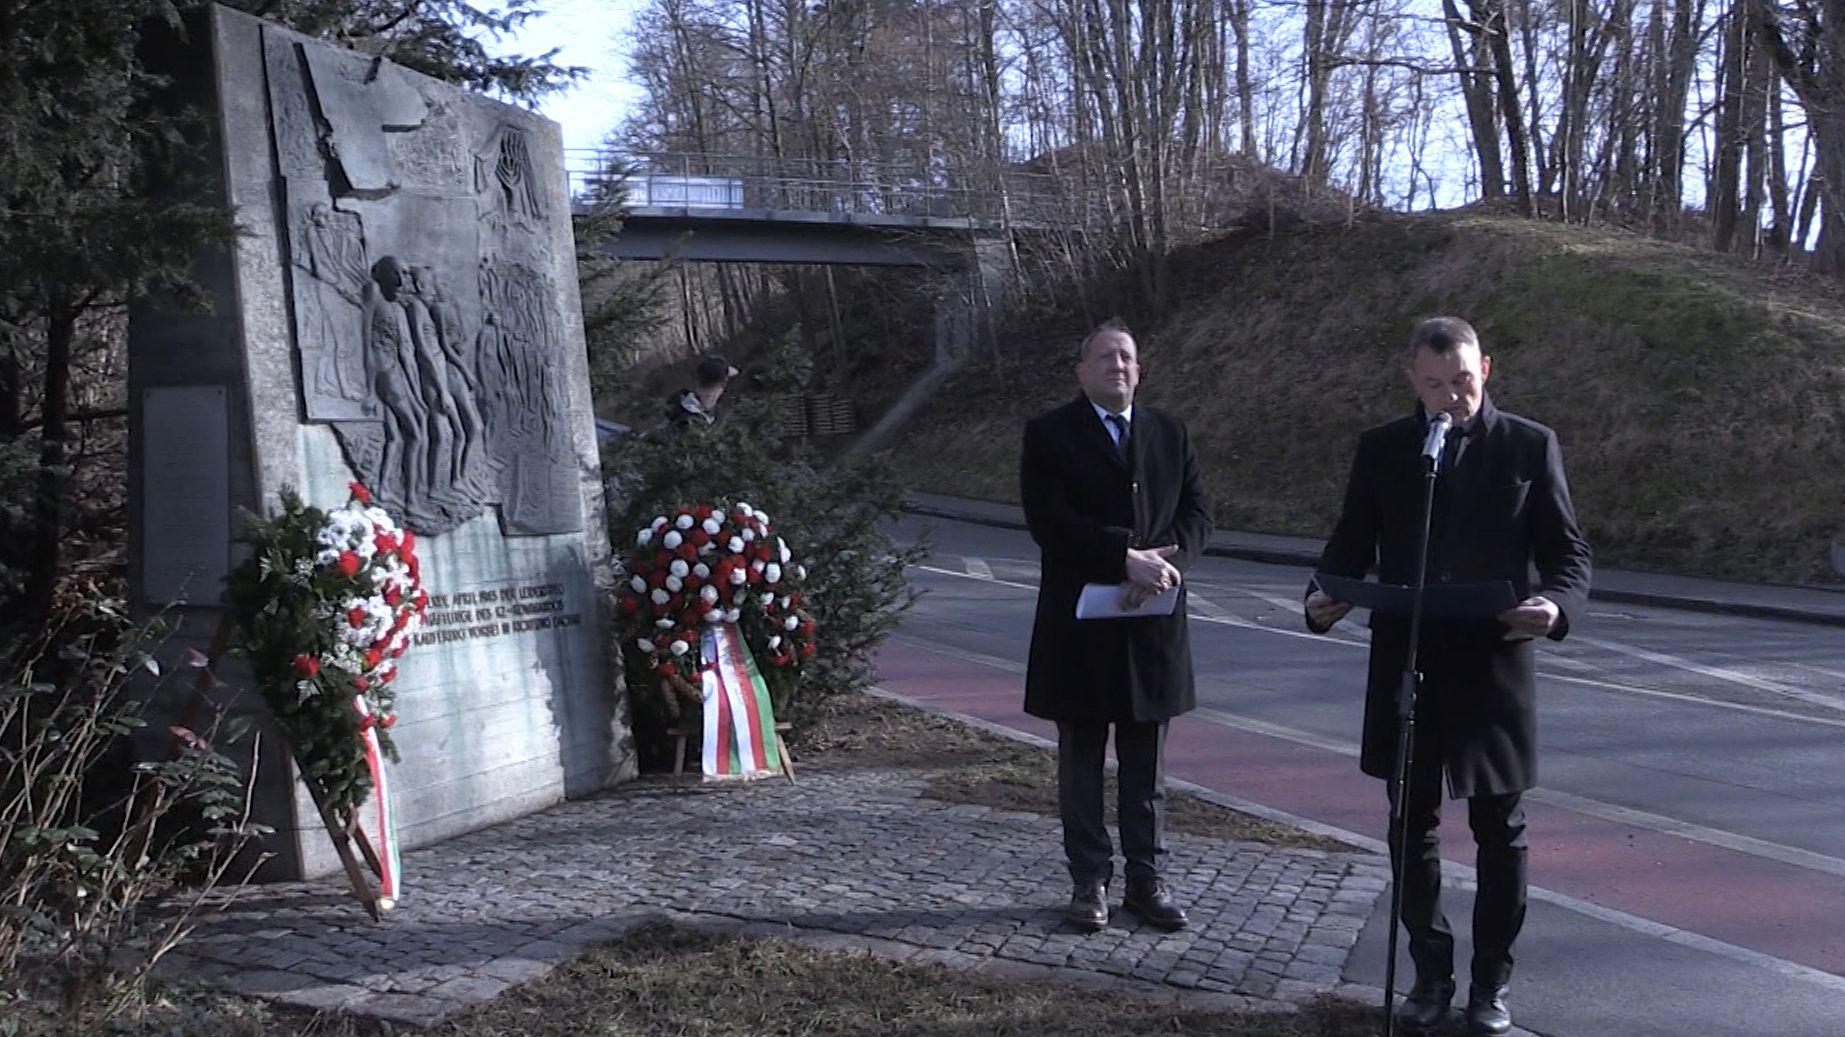 Kranzniederlegung am Todesmarsch-Denkmal in Landsberg am Lech